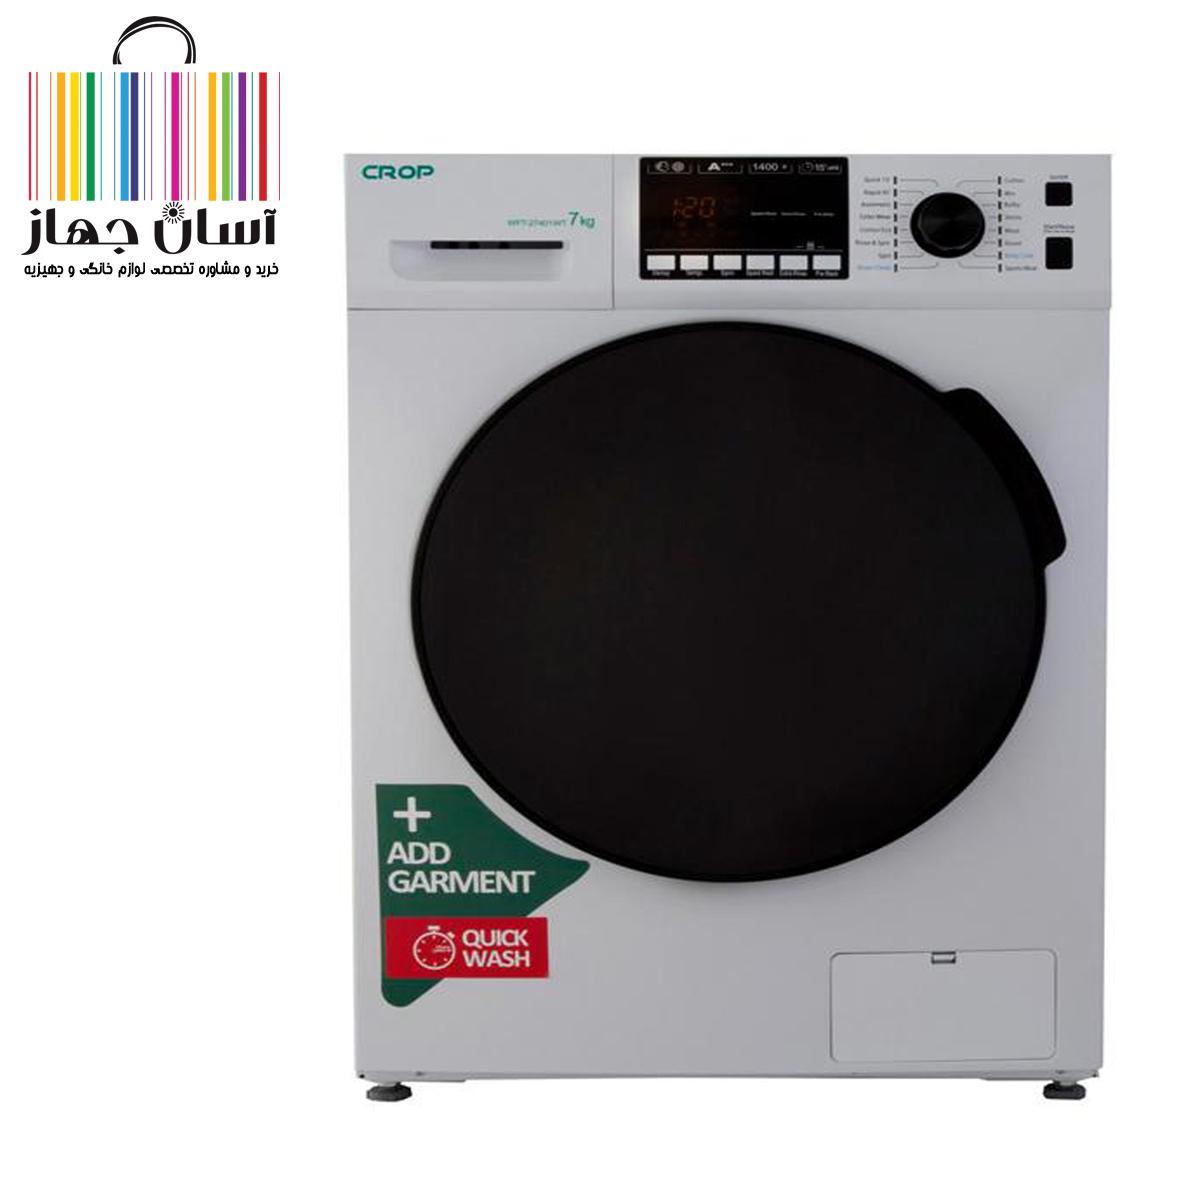 ماشین لباسشویی کروپ مدل WFT- 27401 ظرفیت 7 کیلوگرم